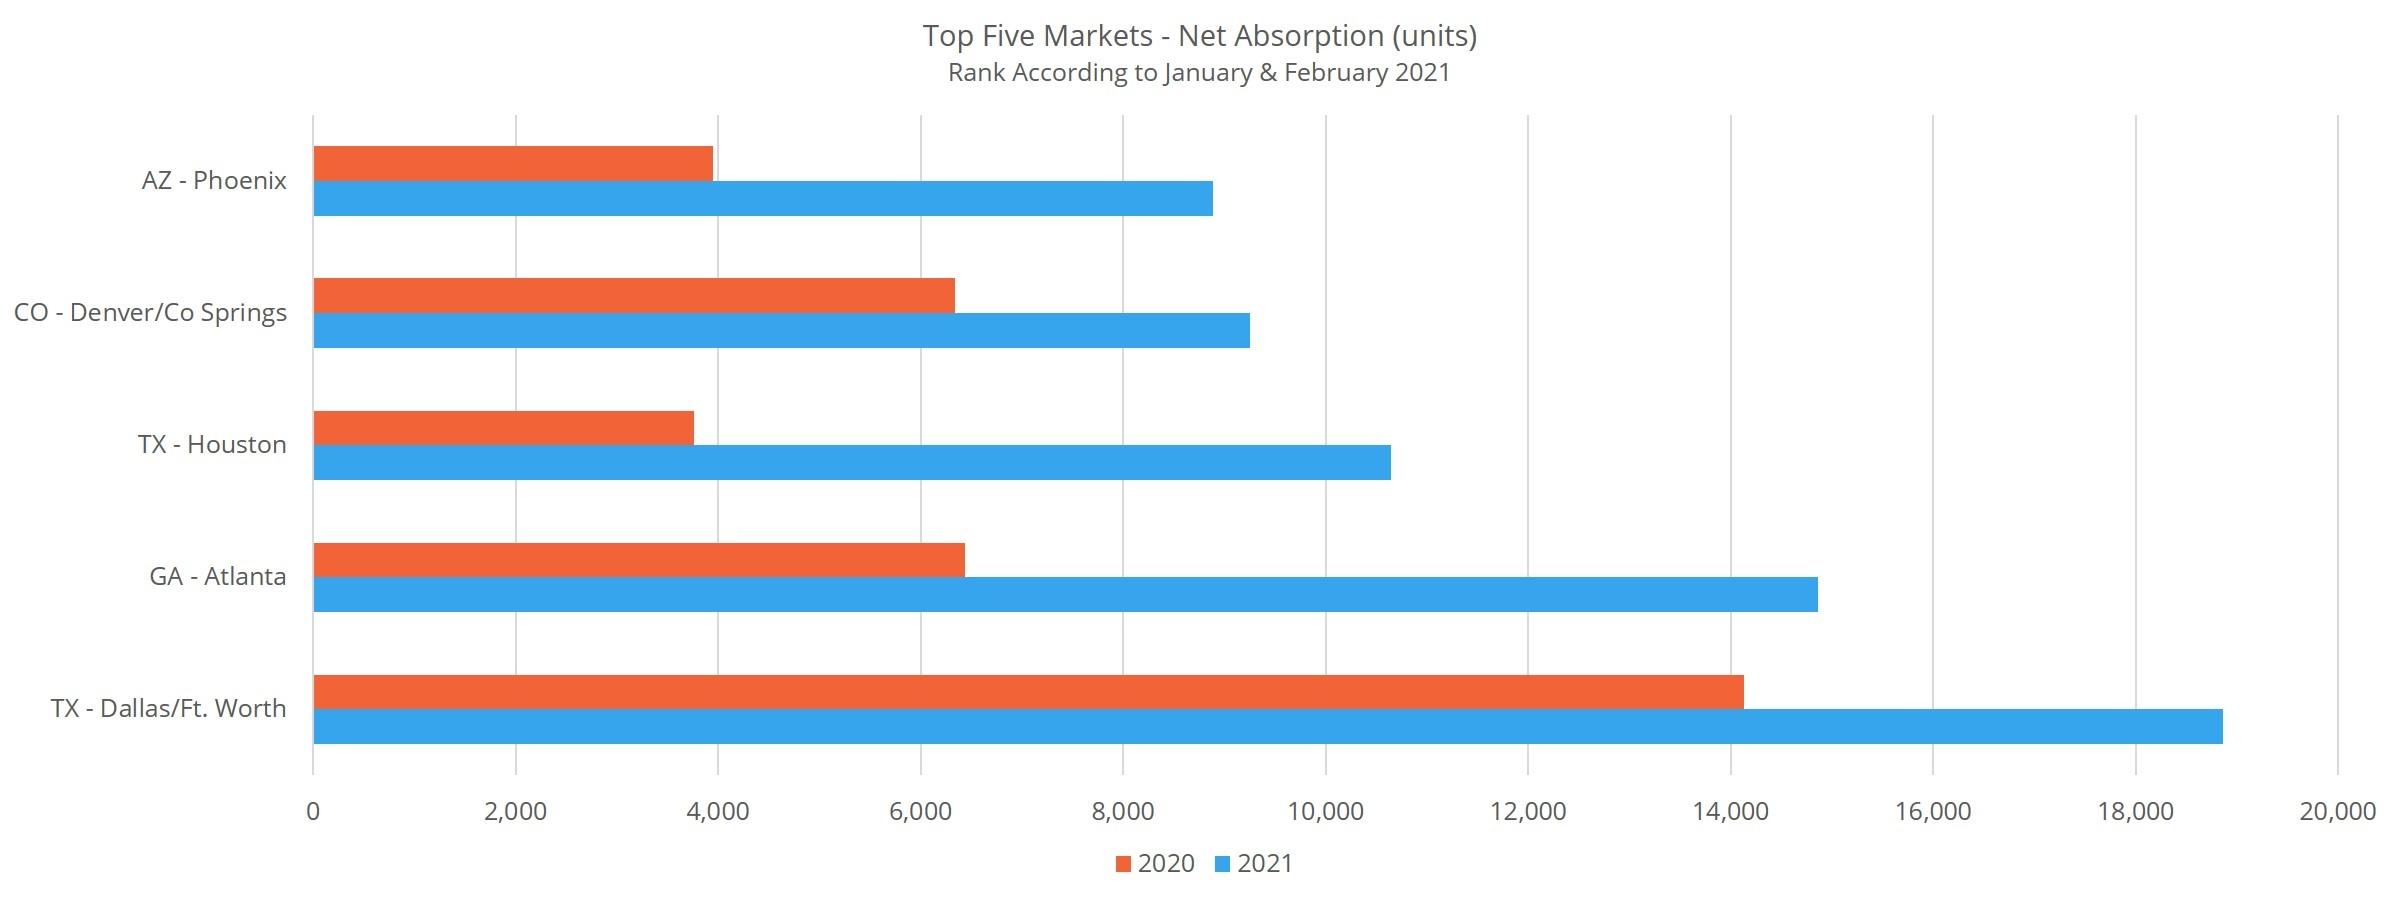 Top Five Markets - Net Absorption (units)